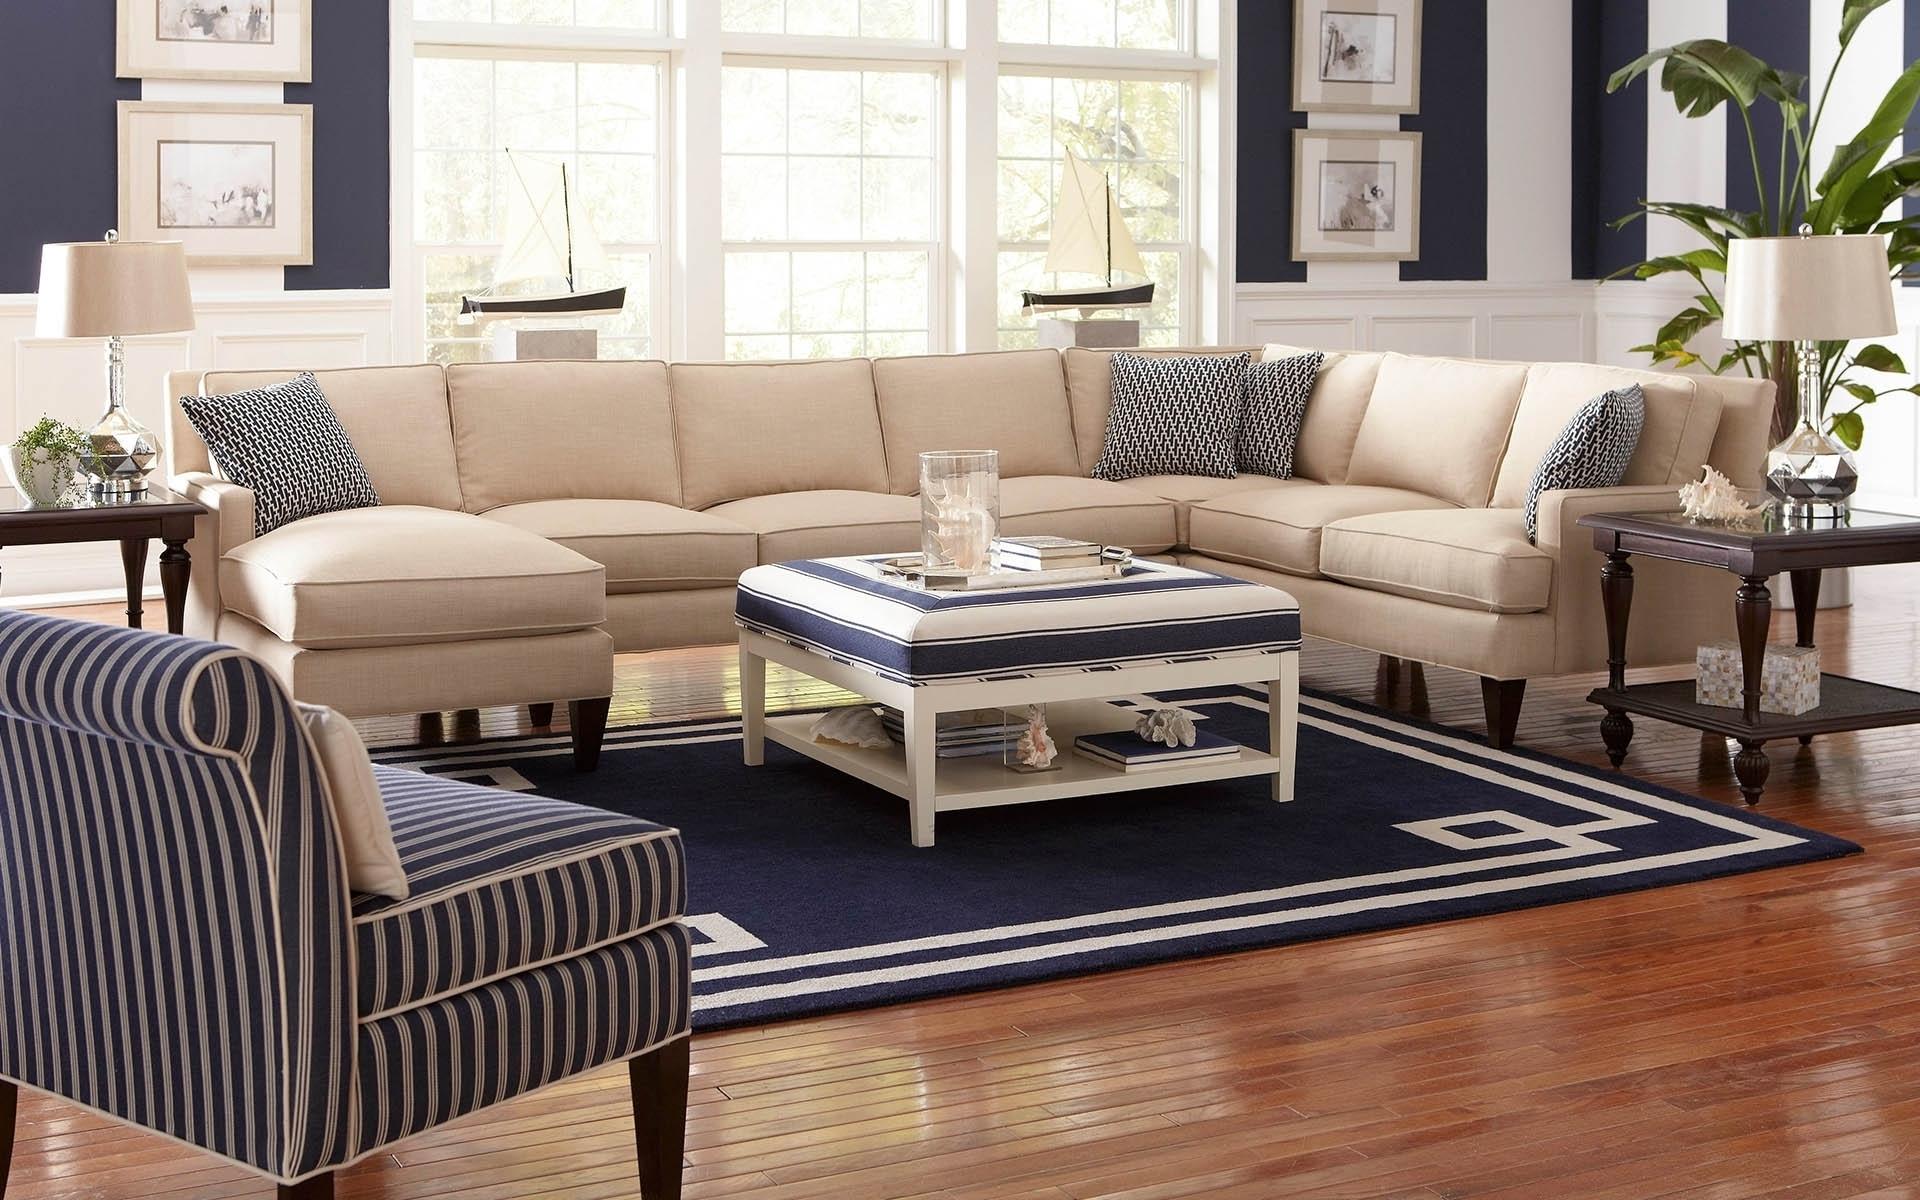 2017 Braxton Sectional Sofas Within Sofa : Amazing Braxton Sectional Sofa Beautiful Home Design (View 14 of 15)